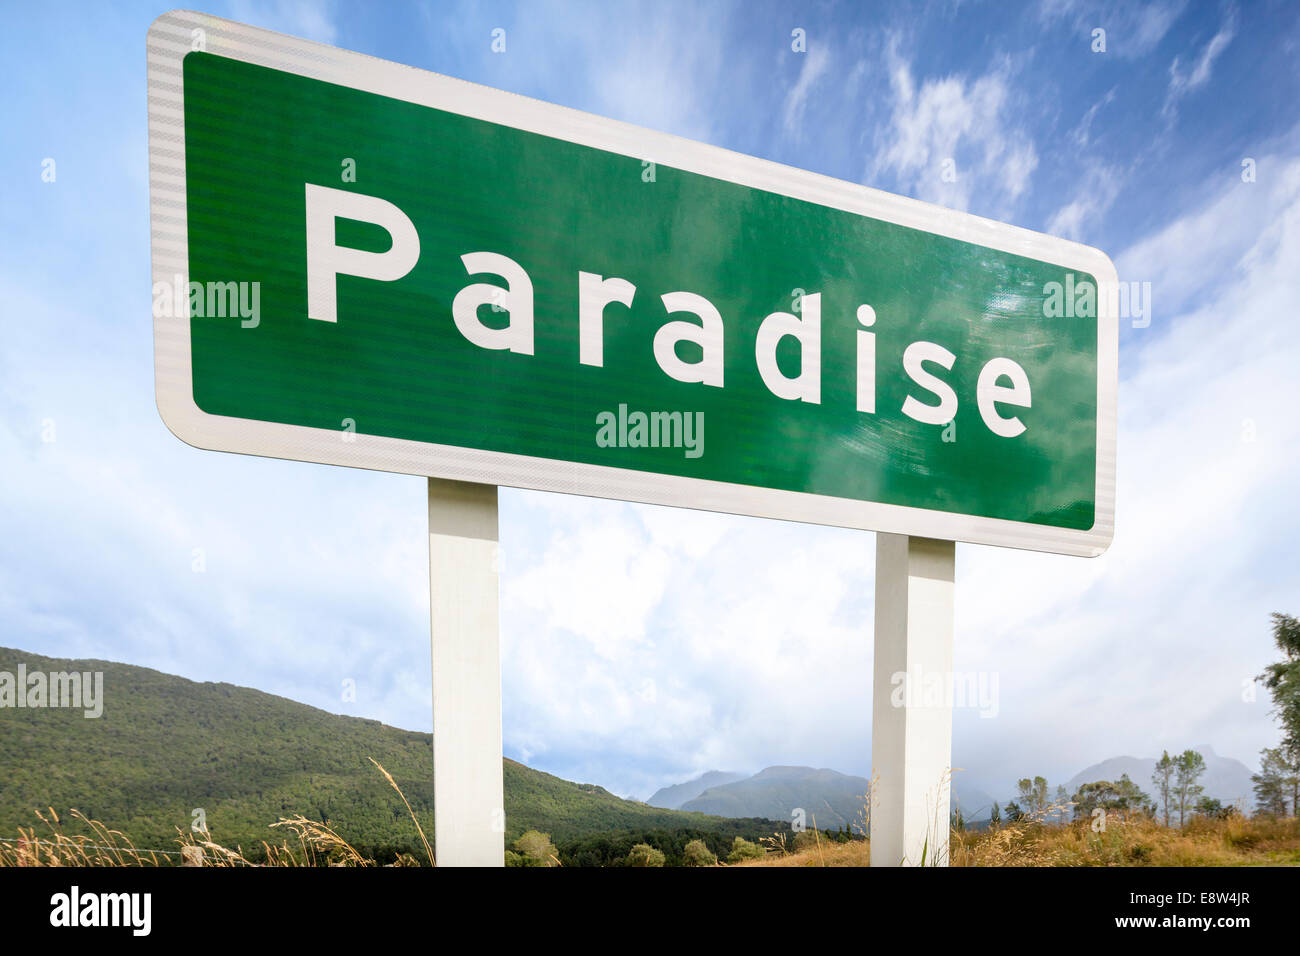 https://c7.alamy.com/comp/E8W4JR/paradise-is-a-pastoral-rural-place-in-otago-region-of-new-zealand-E8W4JR.jpg